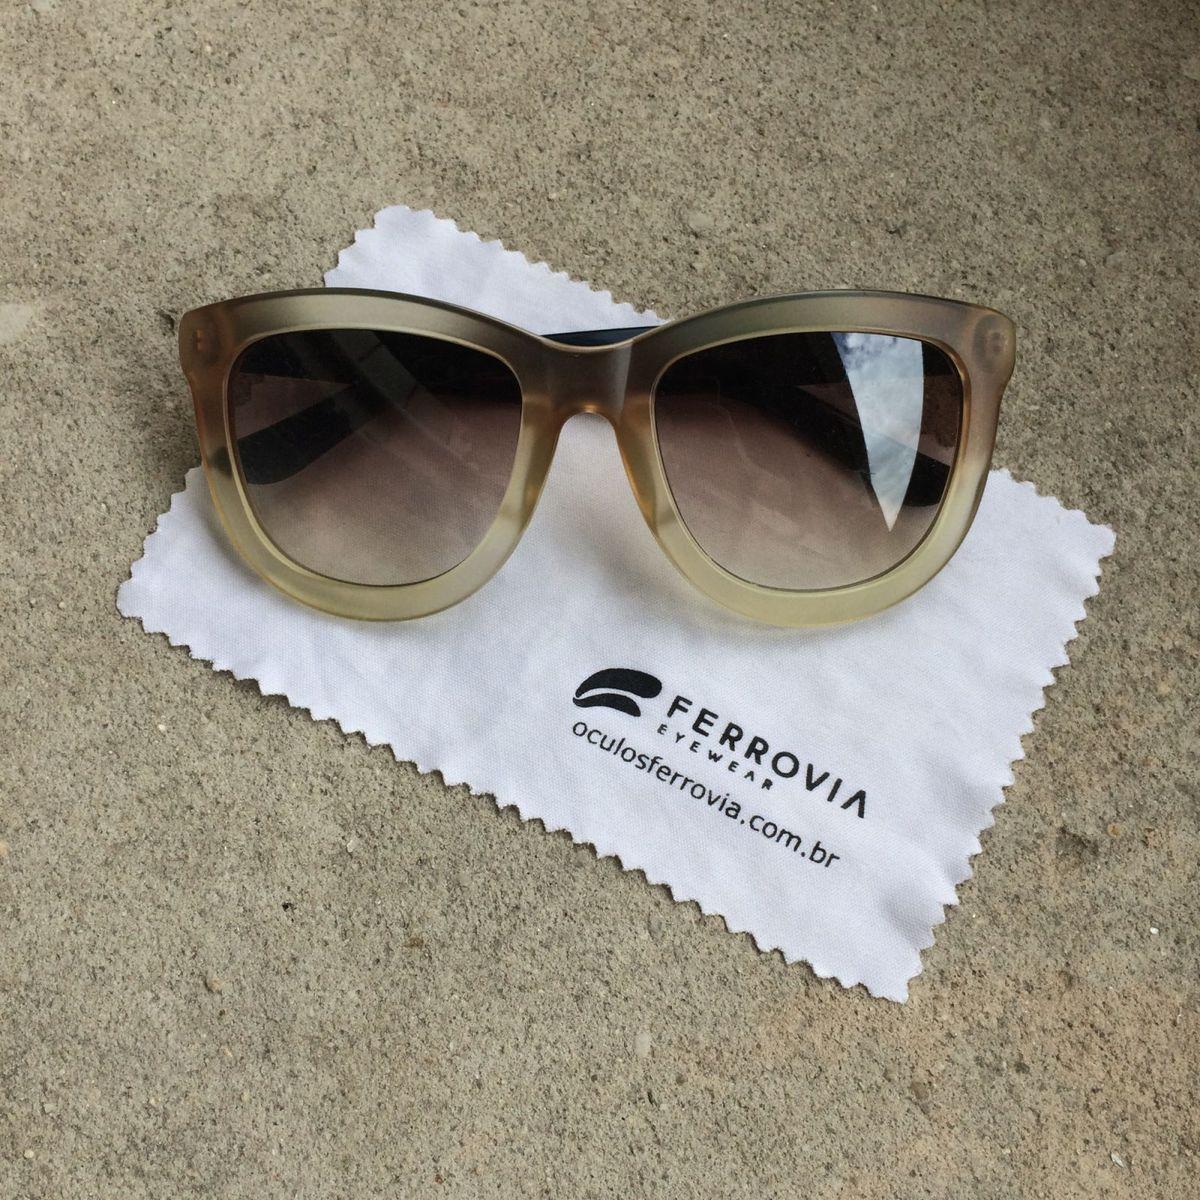 651181b920c19 Óculos Bege Ferrovia